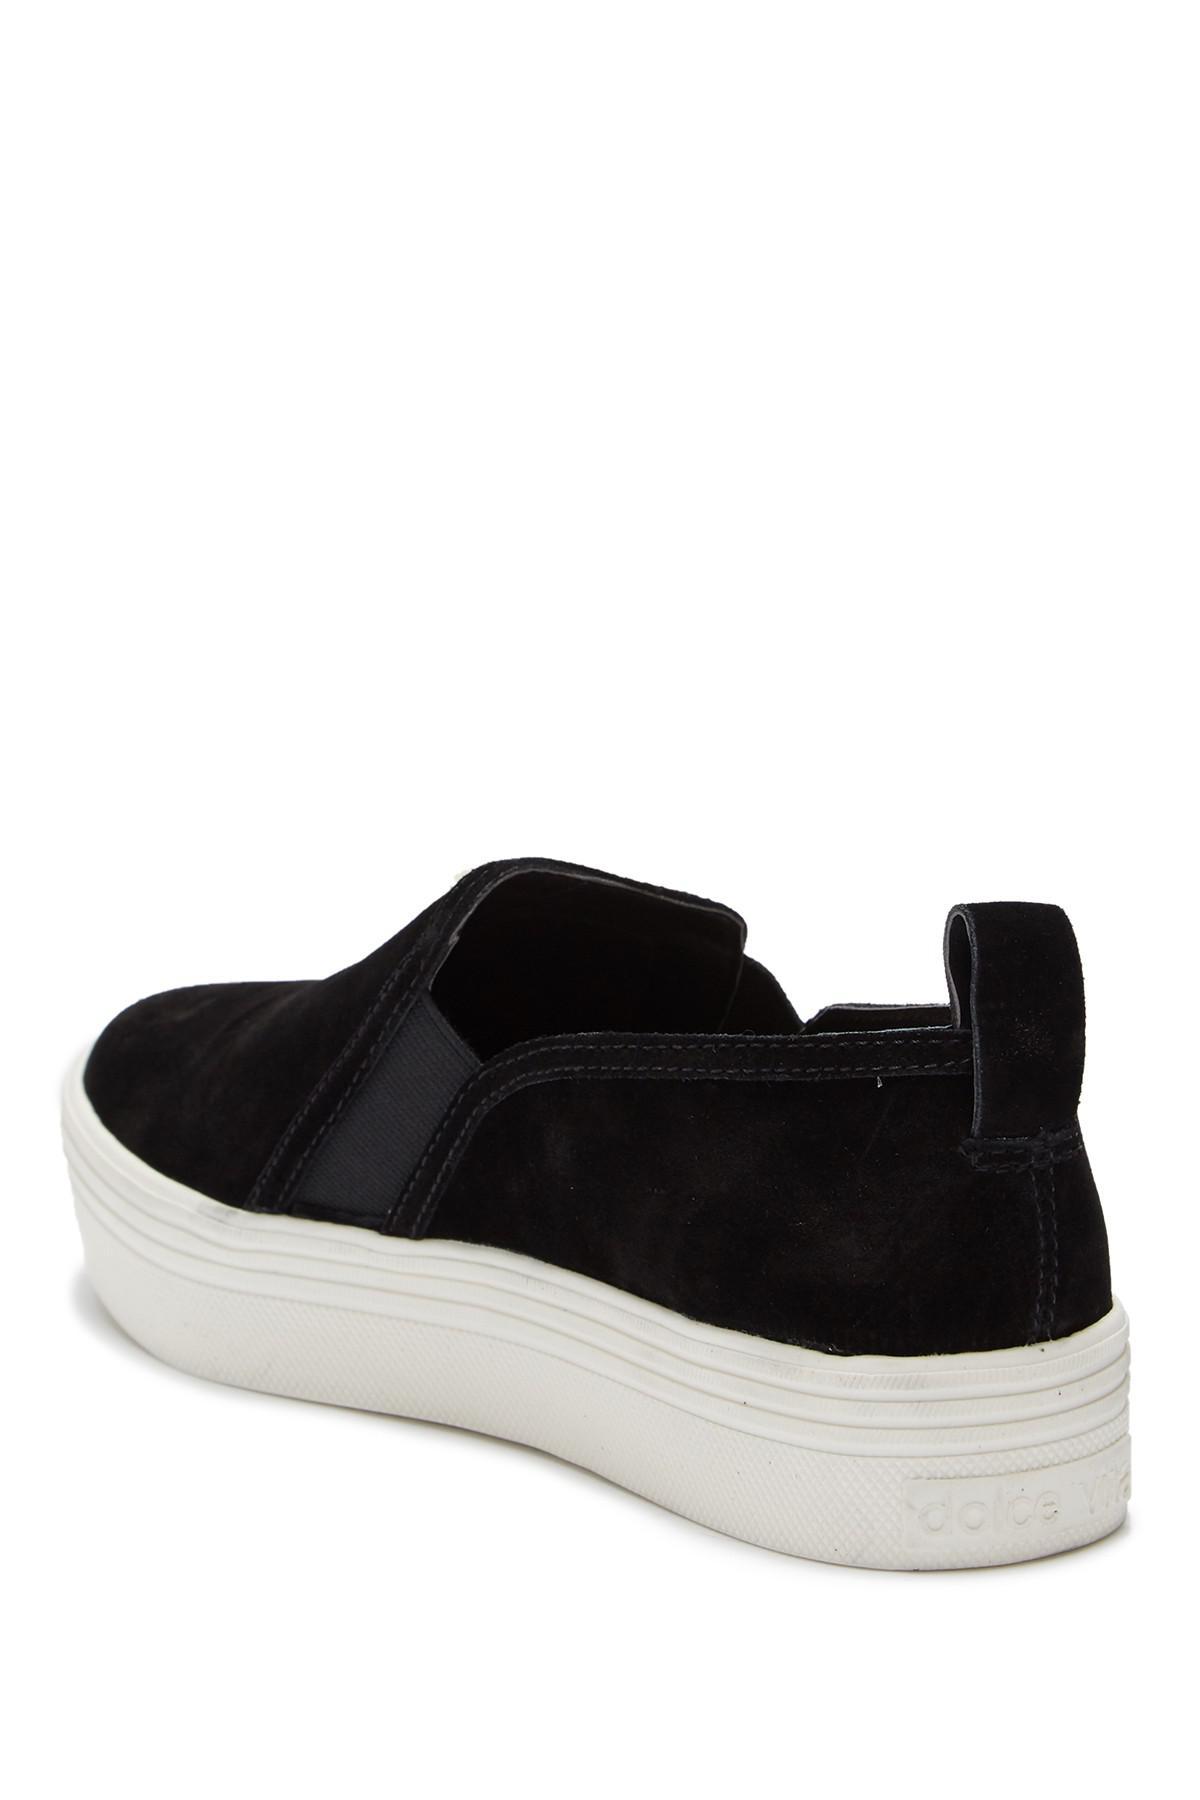 7b07df6ca619 Lyst - Dolce Vita Tannis Double Gored Platform Sneaker in Black